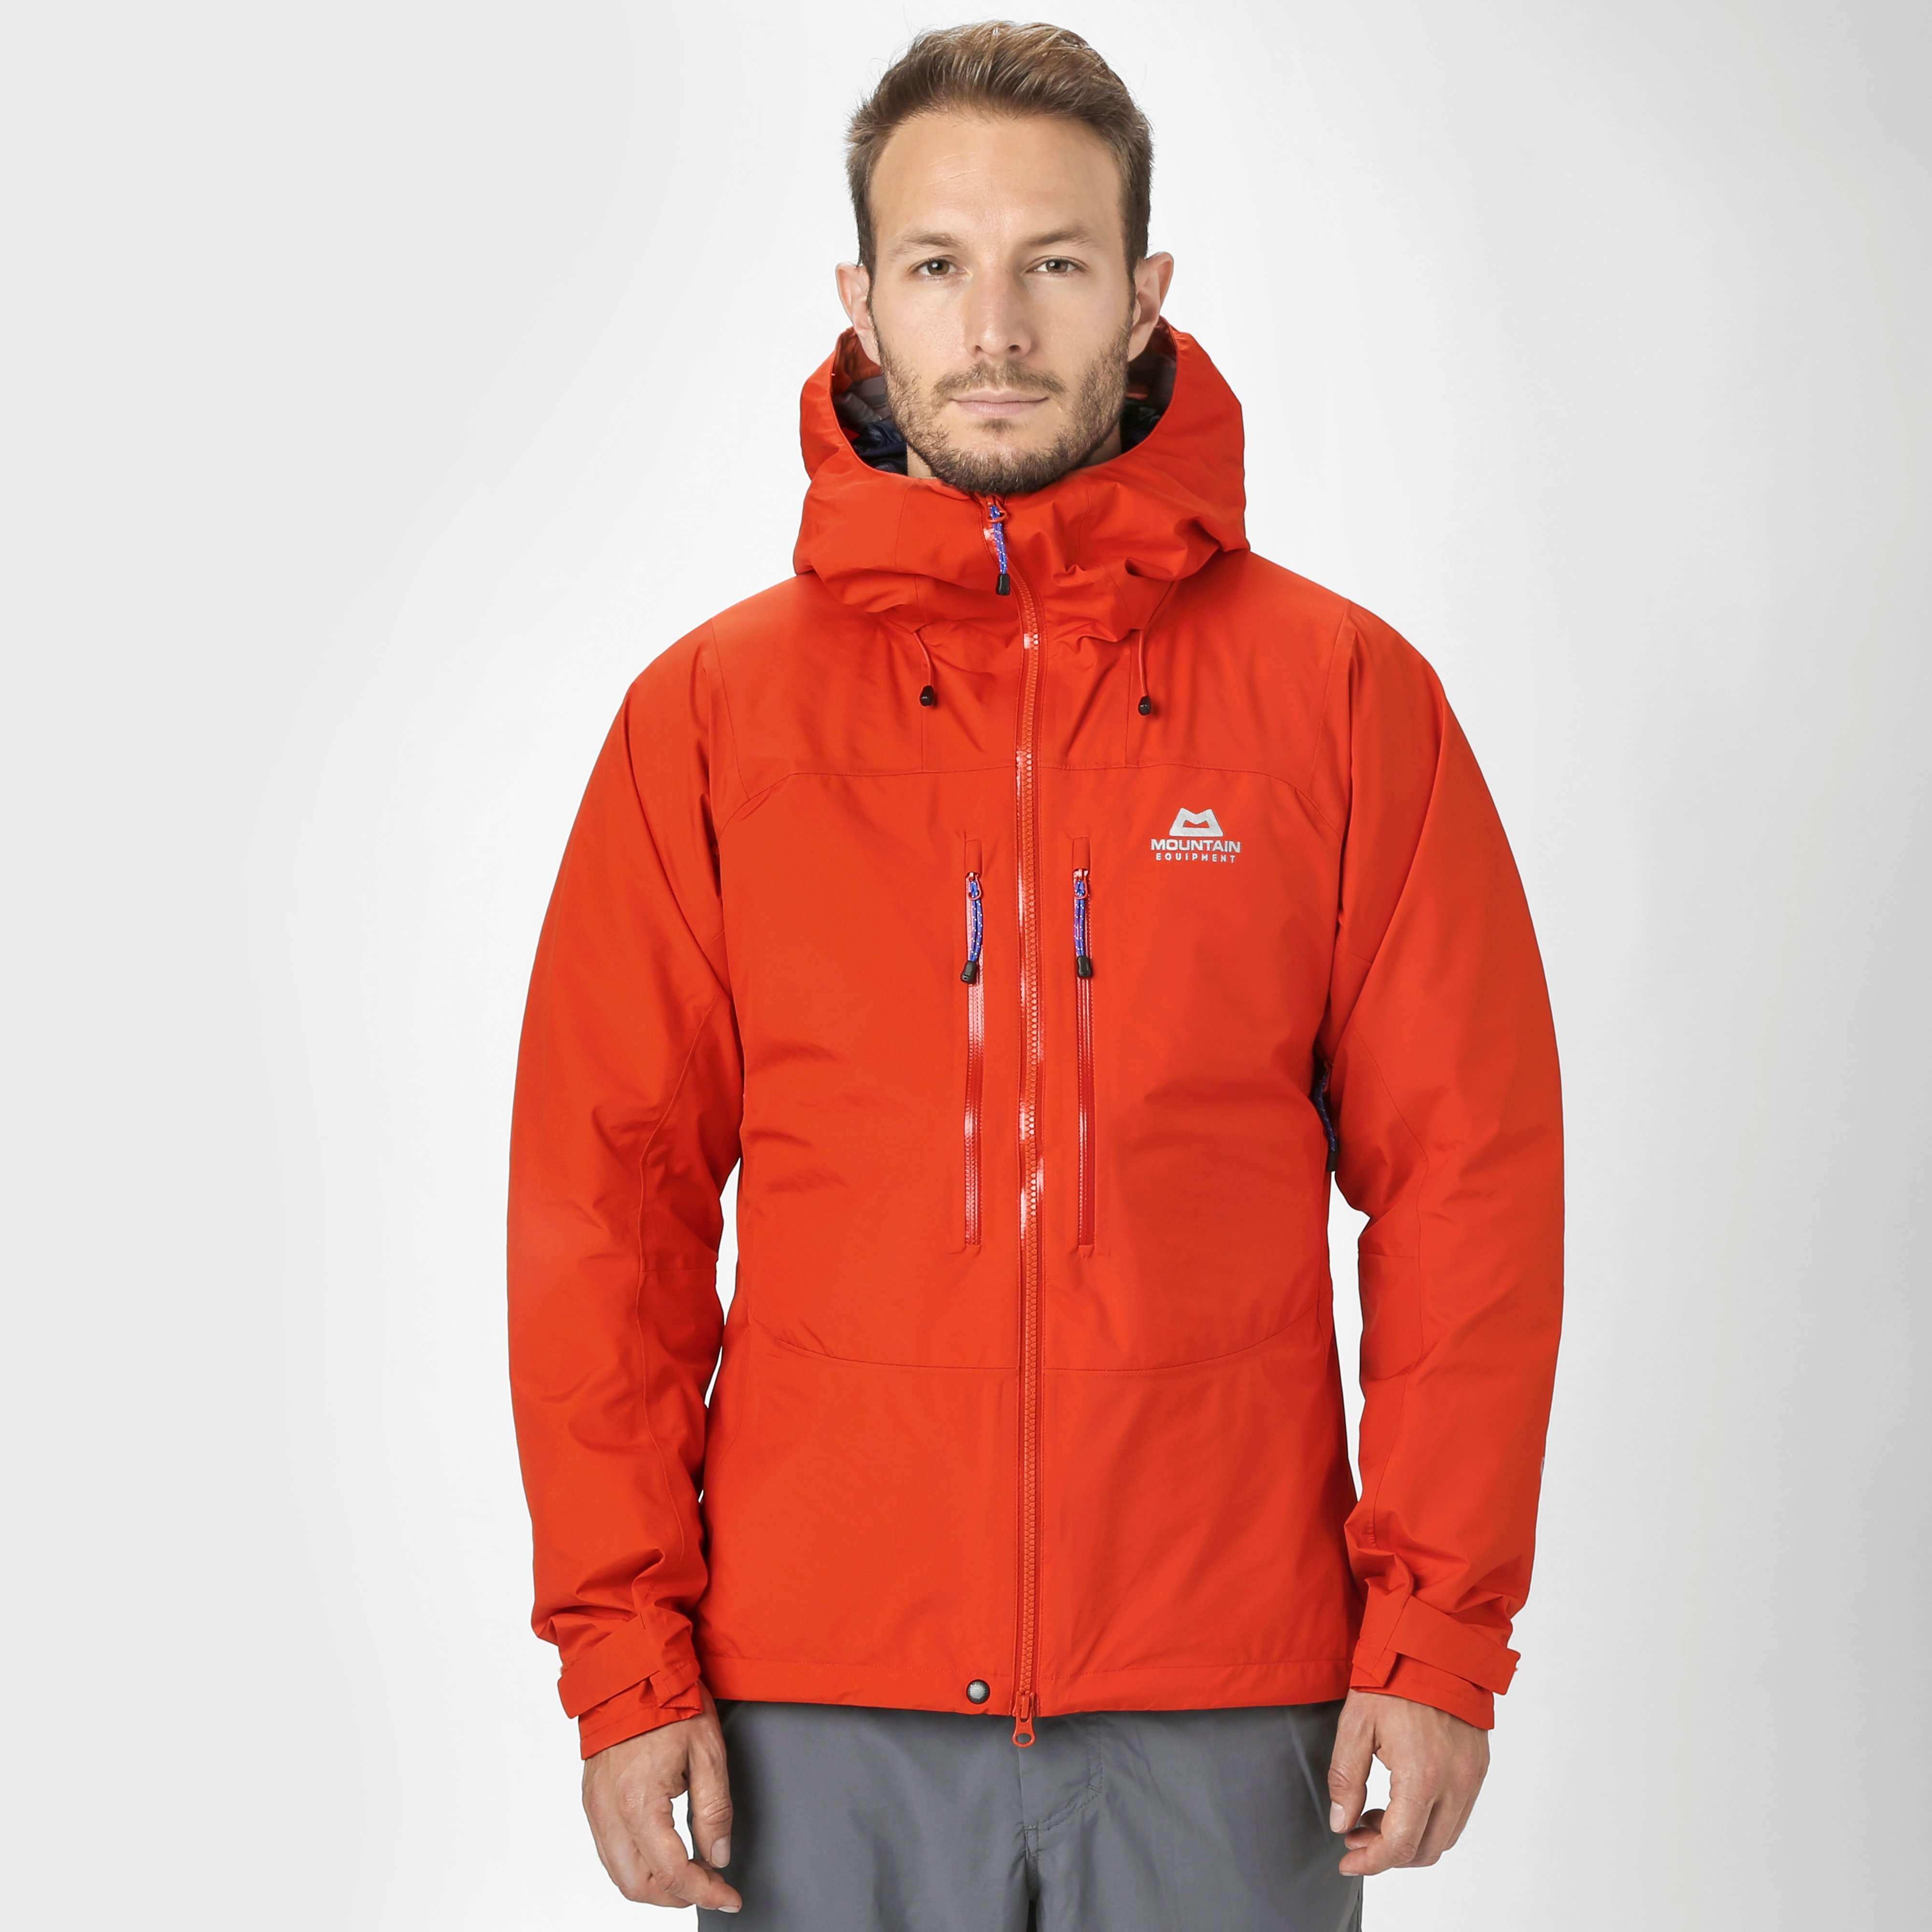 MOUNTAIN EQUIPMENT Men's Narwhal Waterproof Jacket